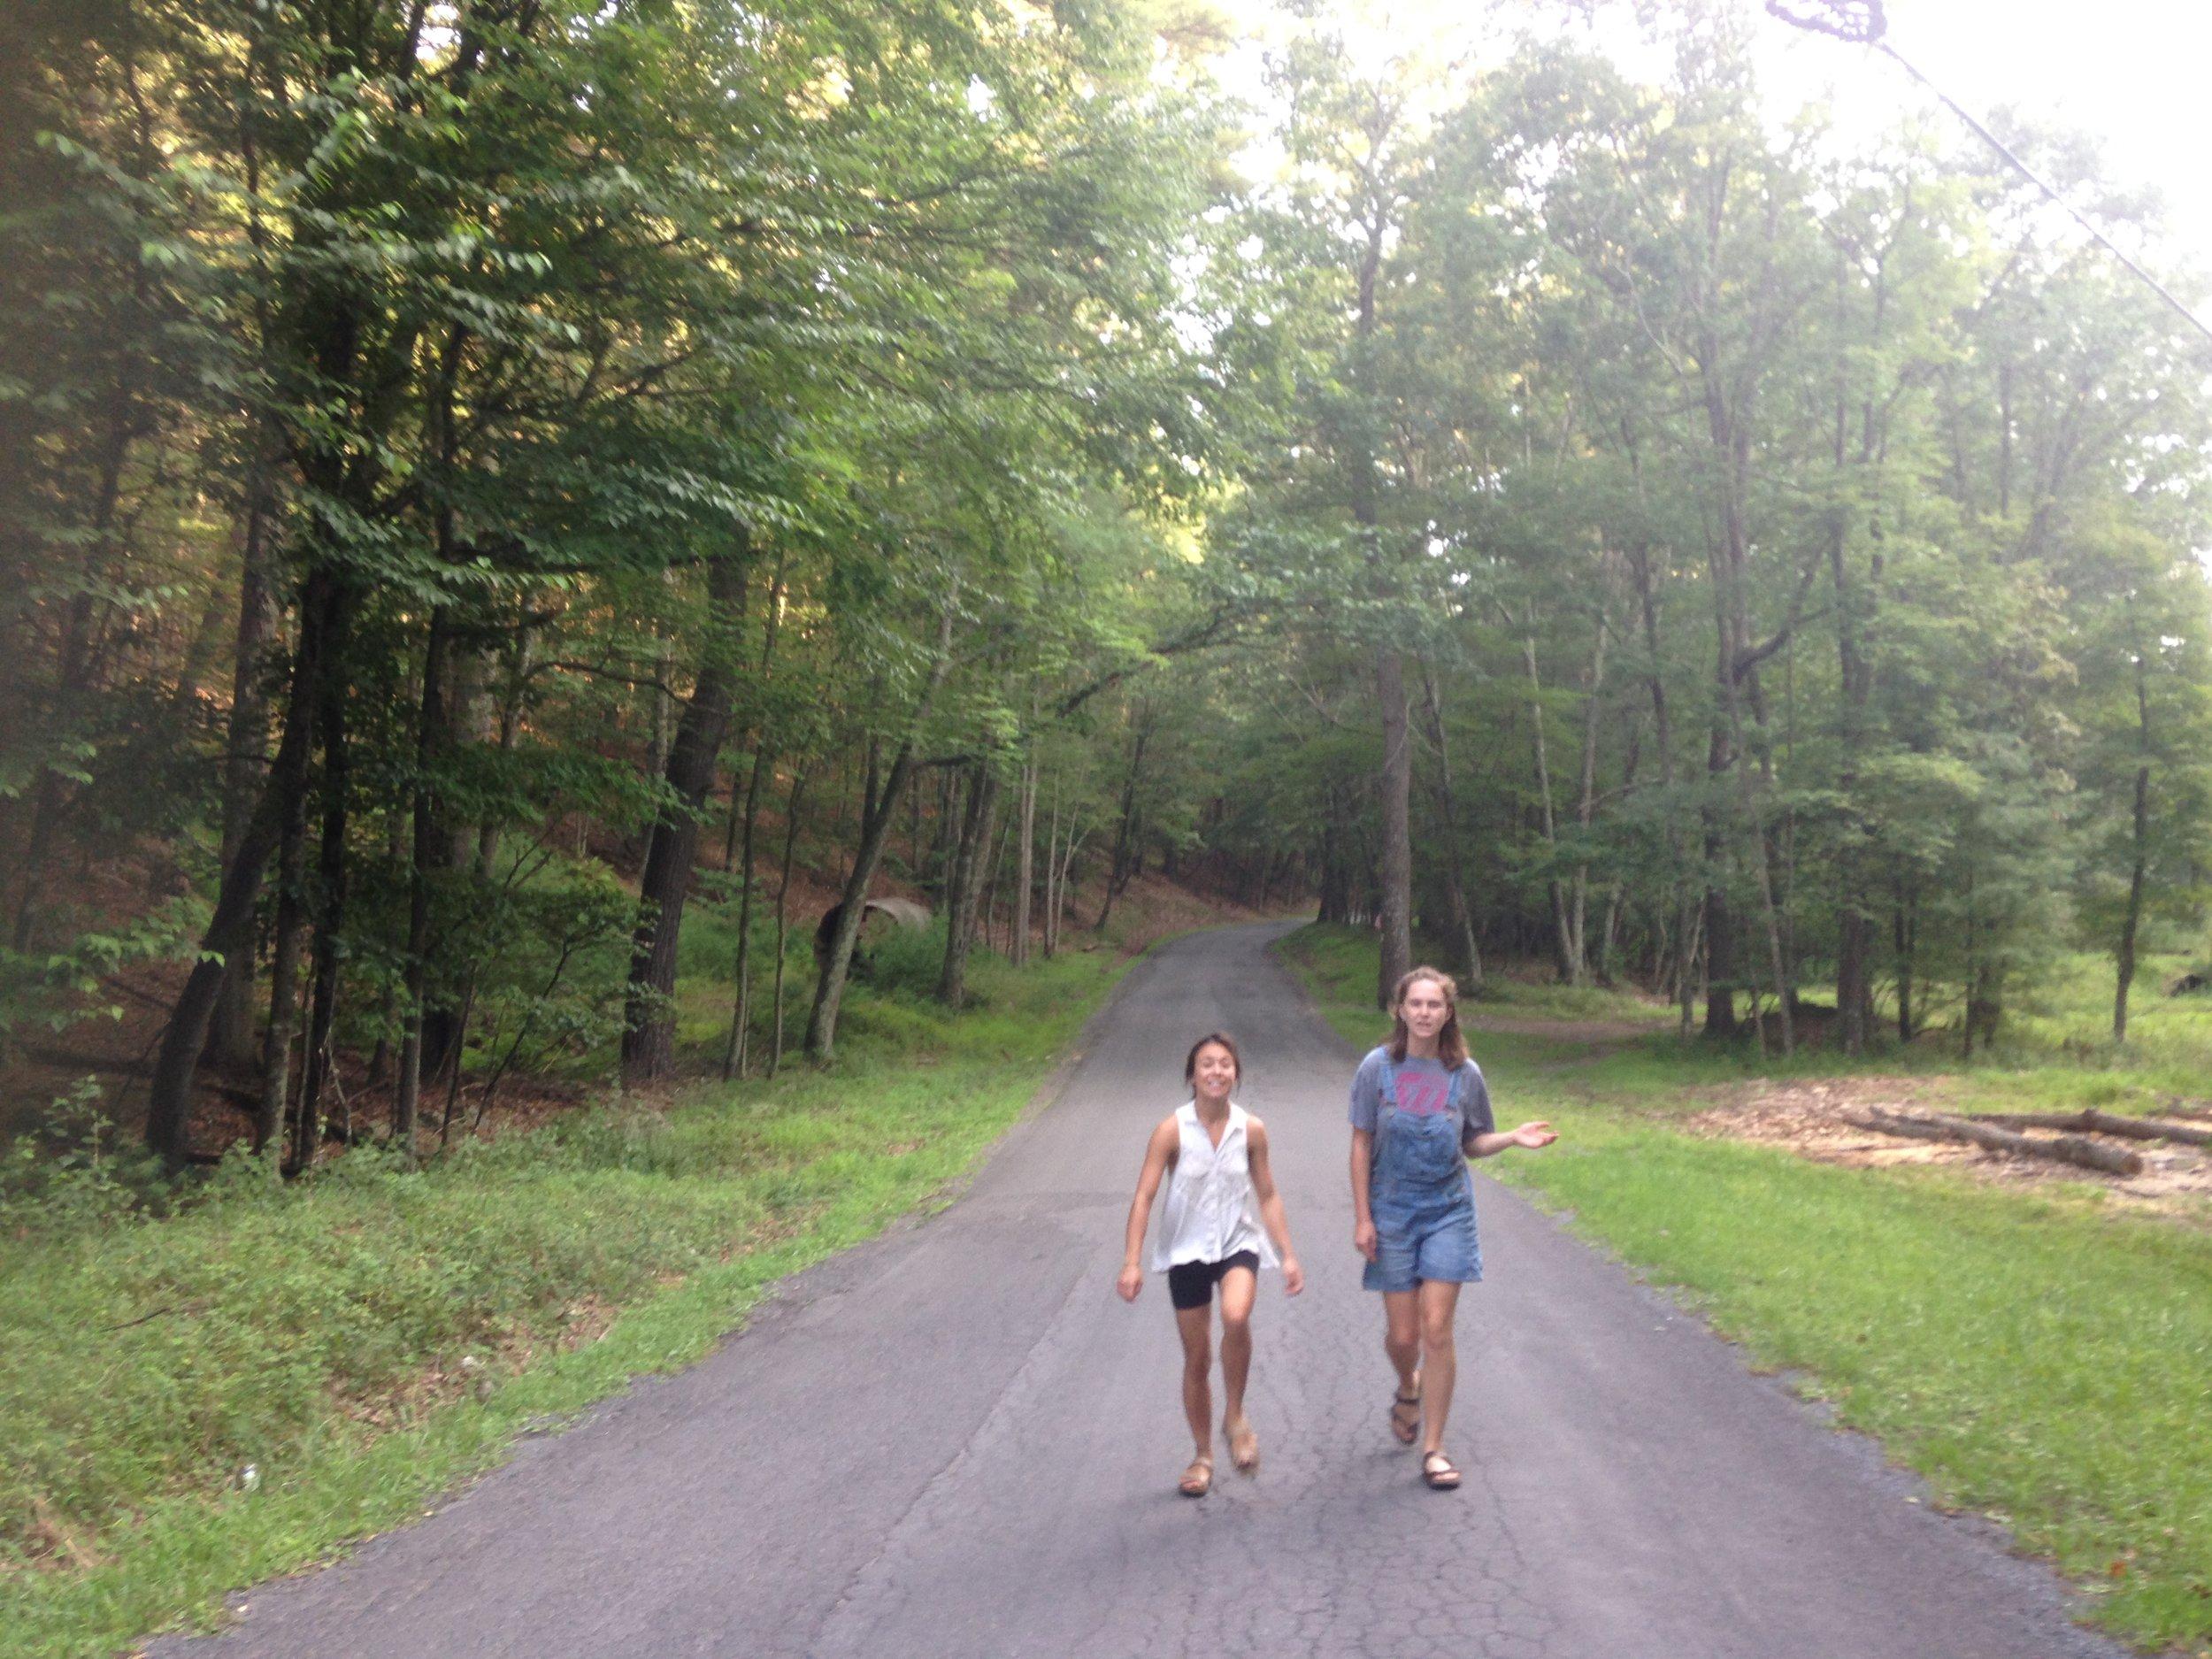 Strolling in West Virginia.